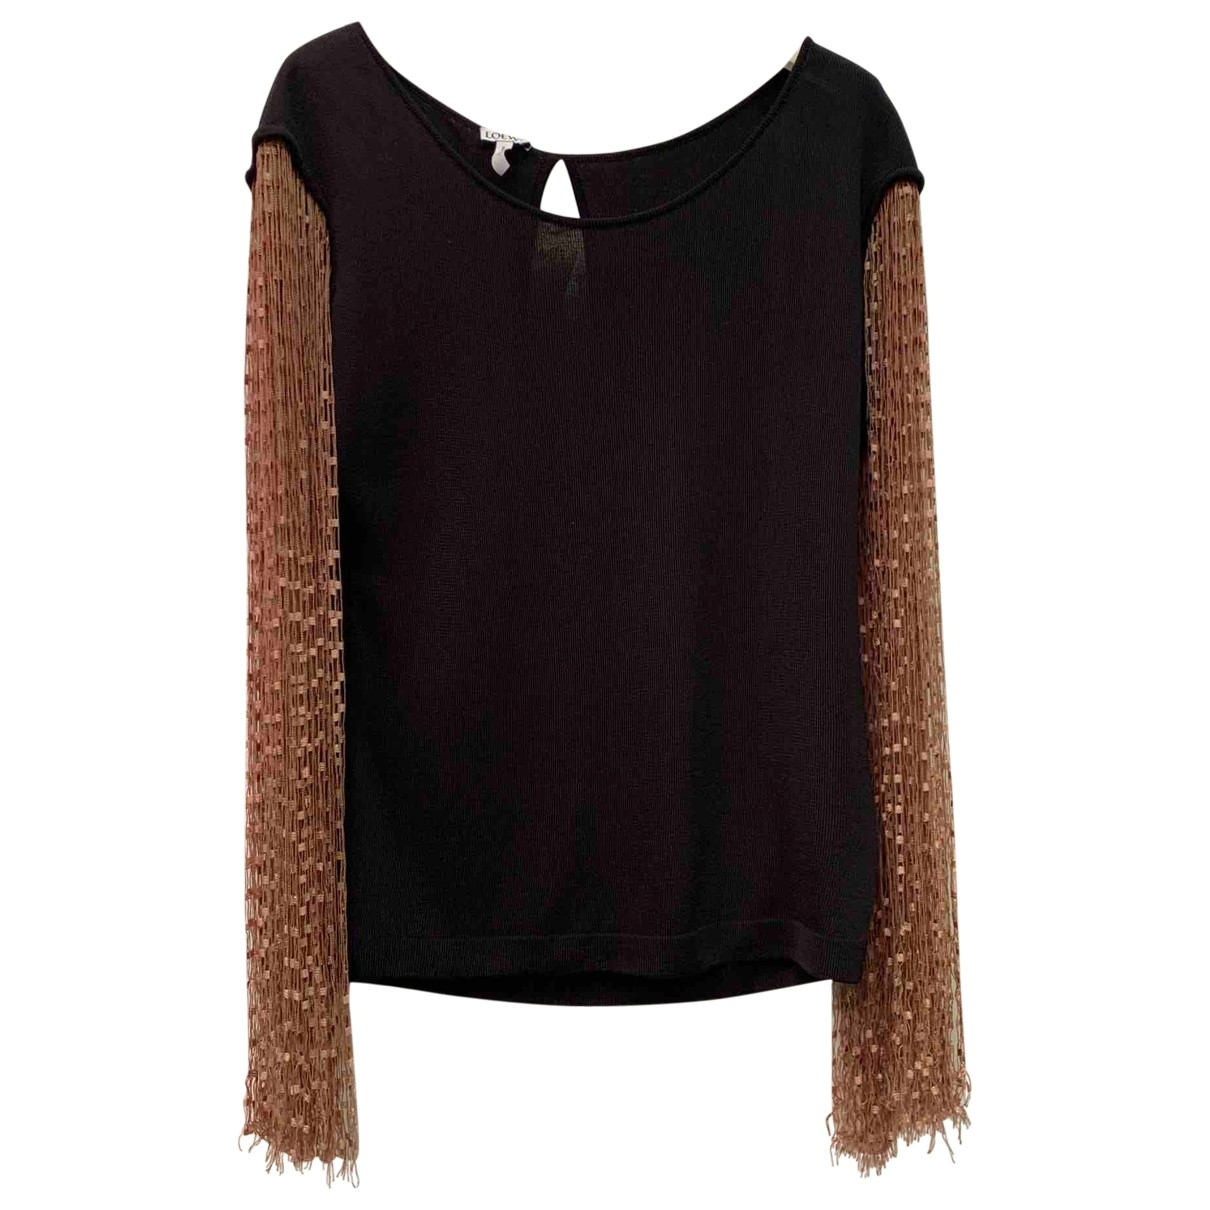 Loewe \N Black Cotton  top for Women XS International